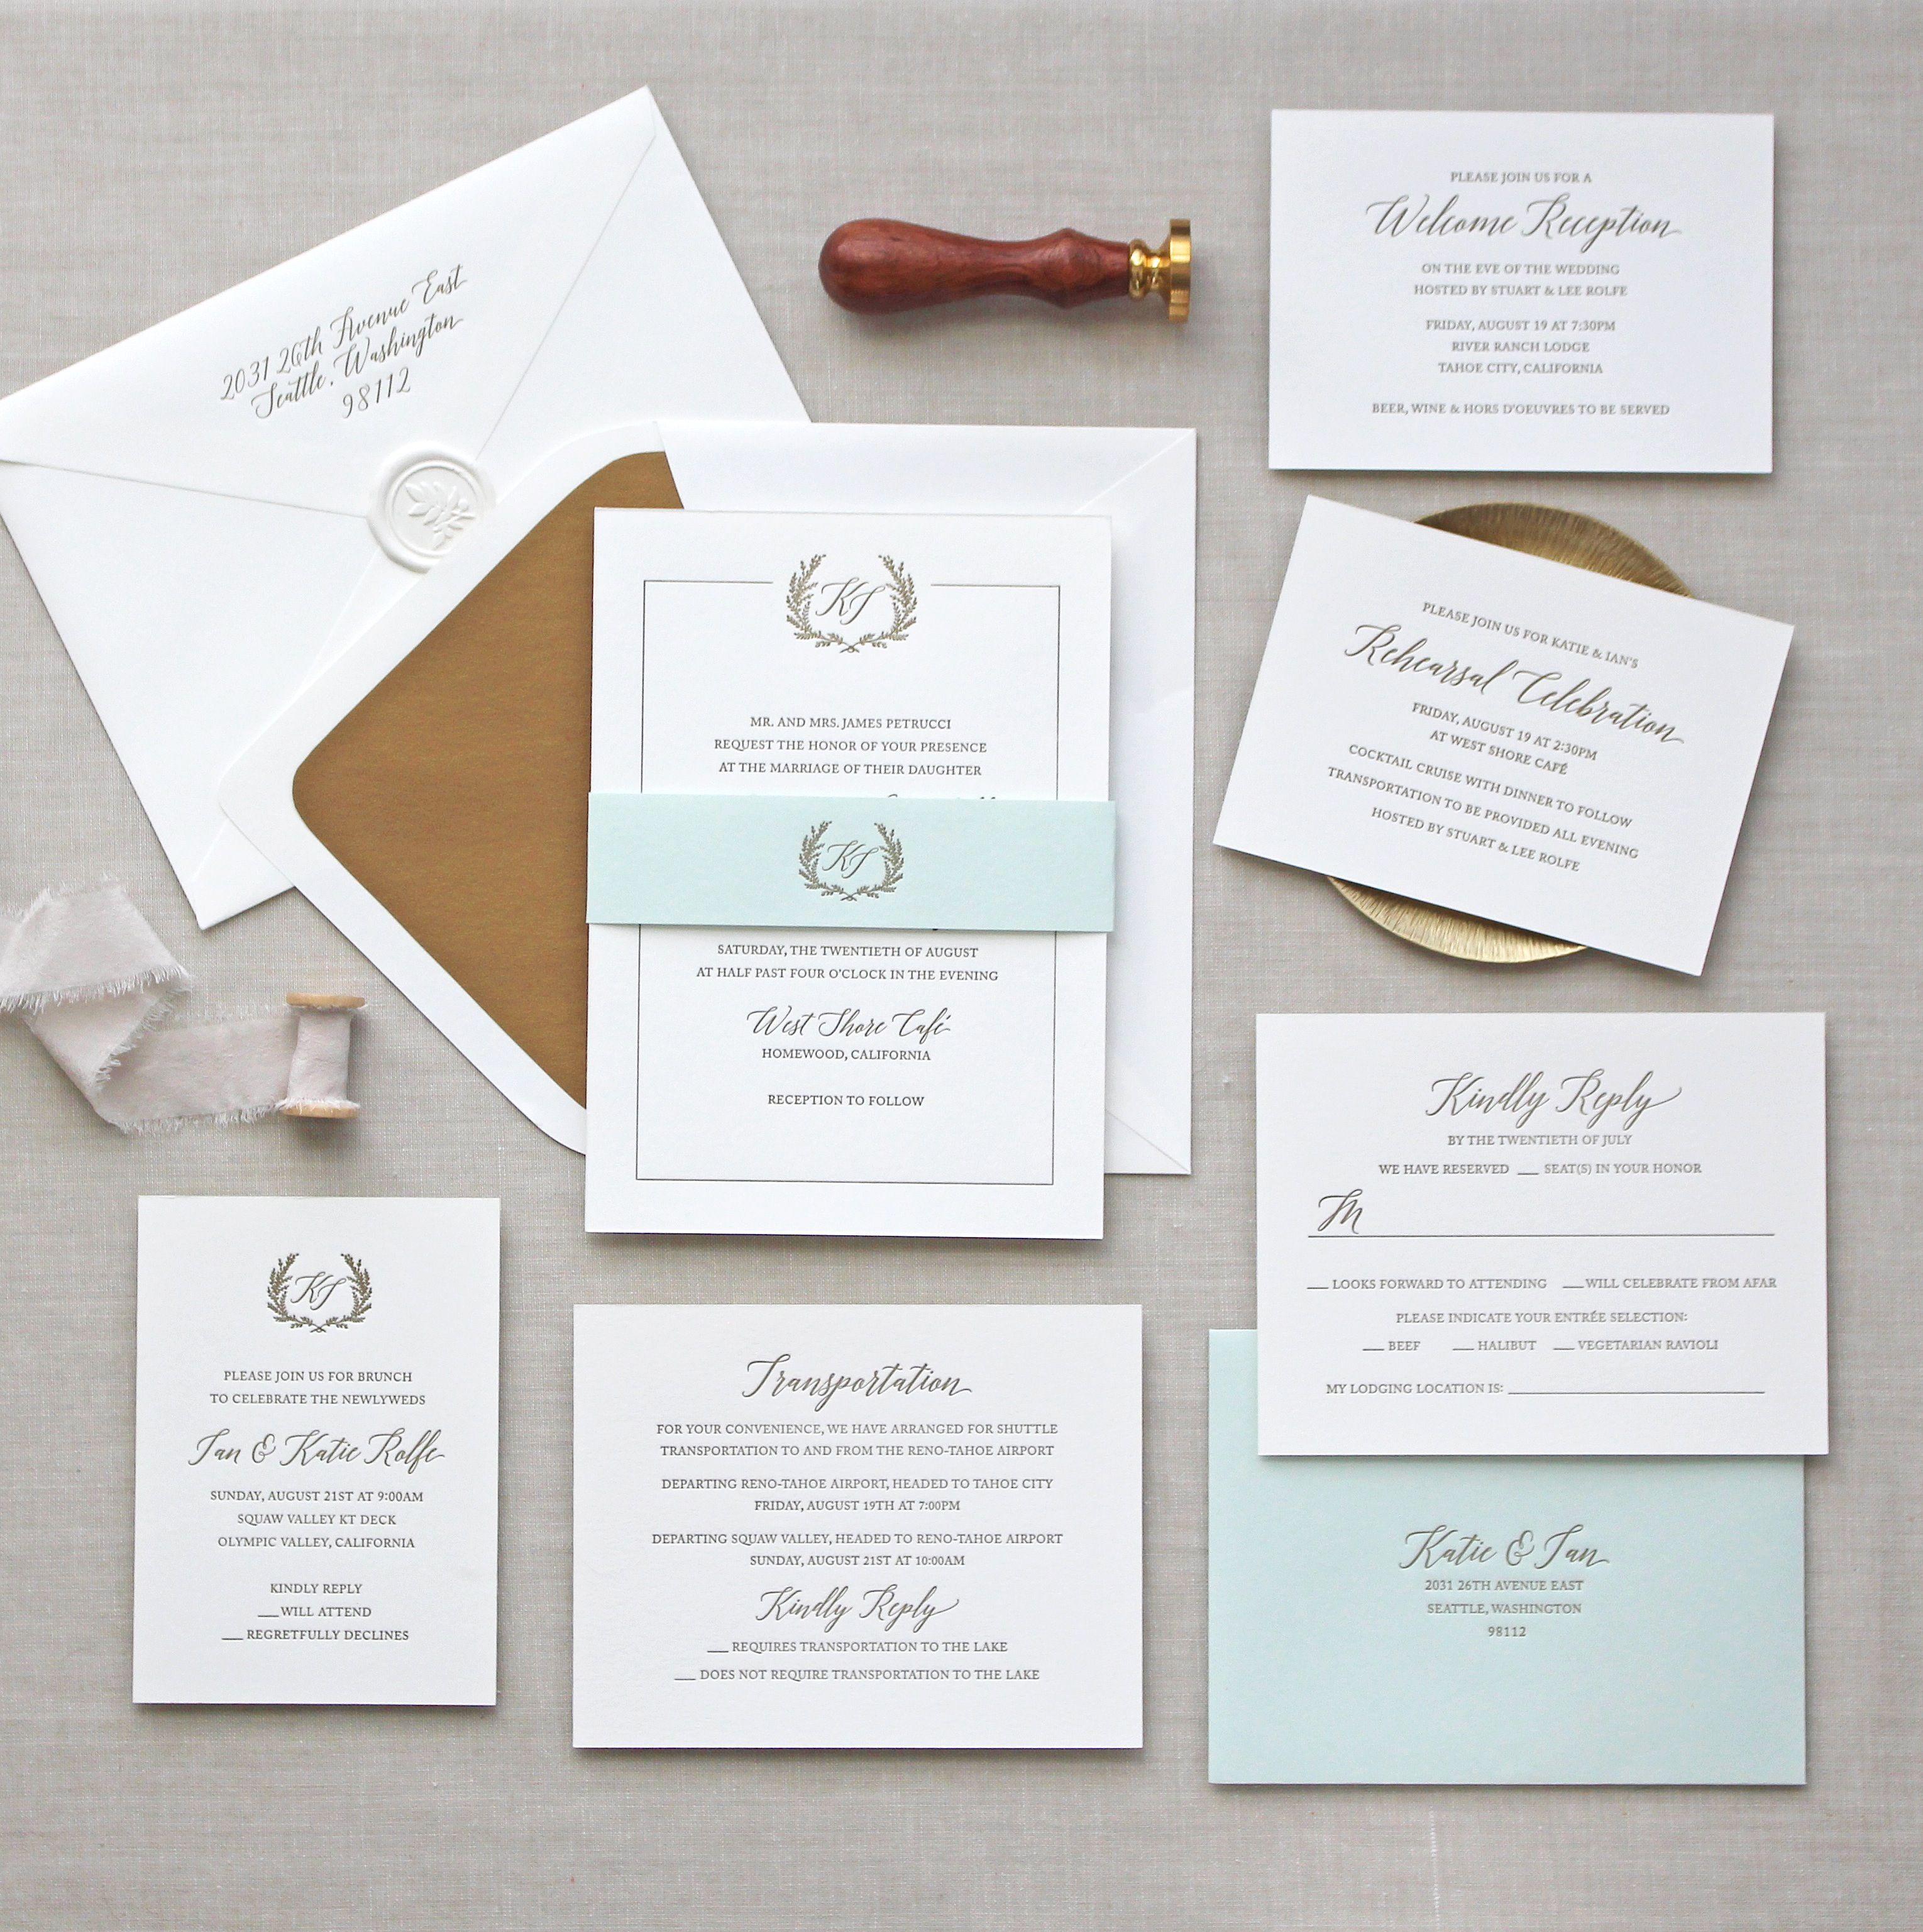 Letterpress Wedding Invitations Jardin Design Chatham Caro Discount Wedding Invitations Letterpress Wedding Invitations Inexpensive Wedding Invitations